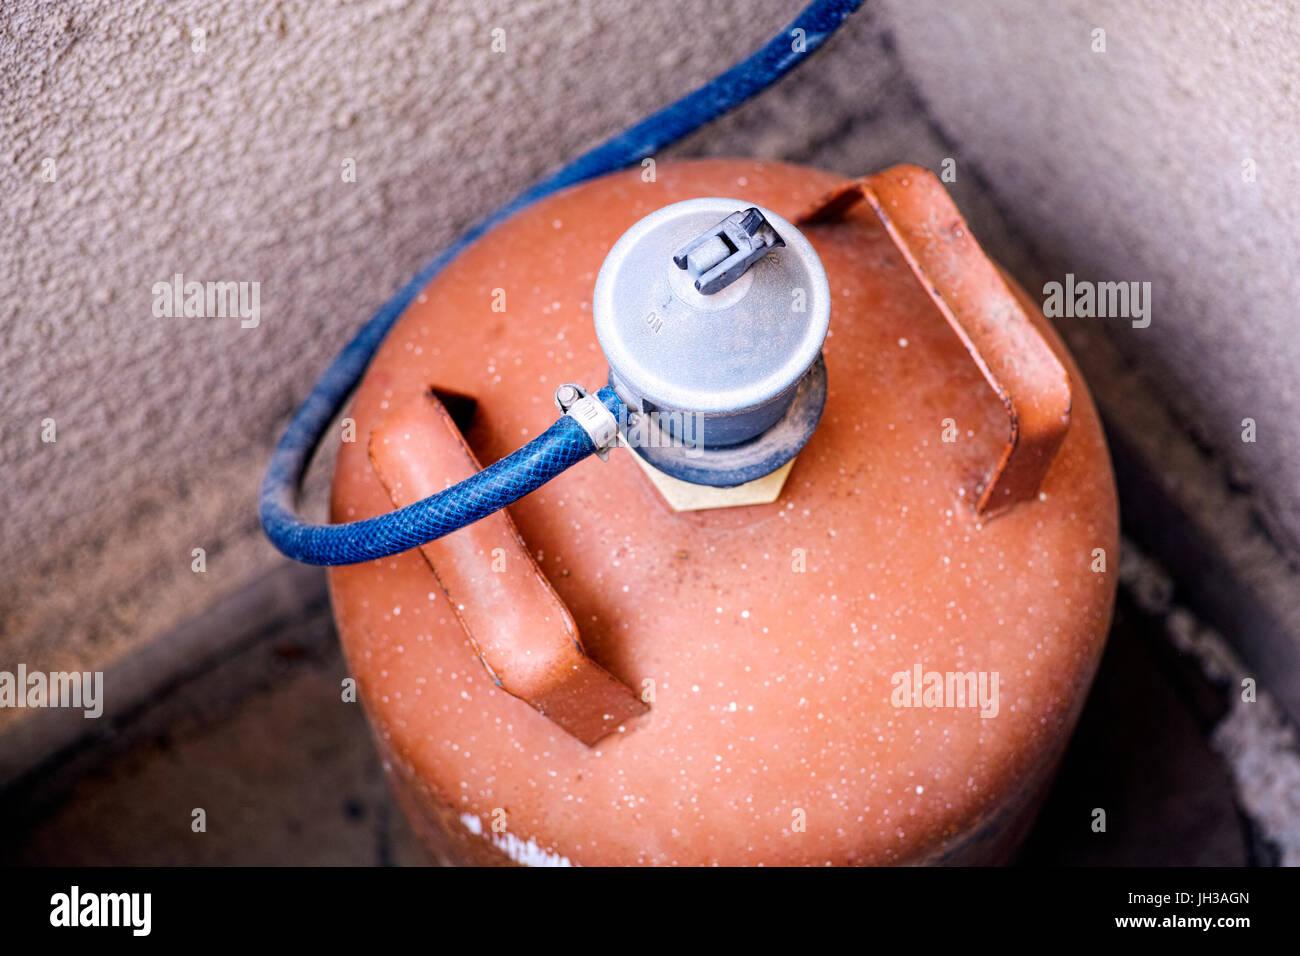 Orange gas bottle with gas regulator stay in corner. - Stock Image